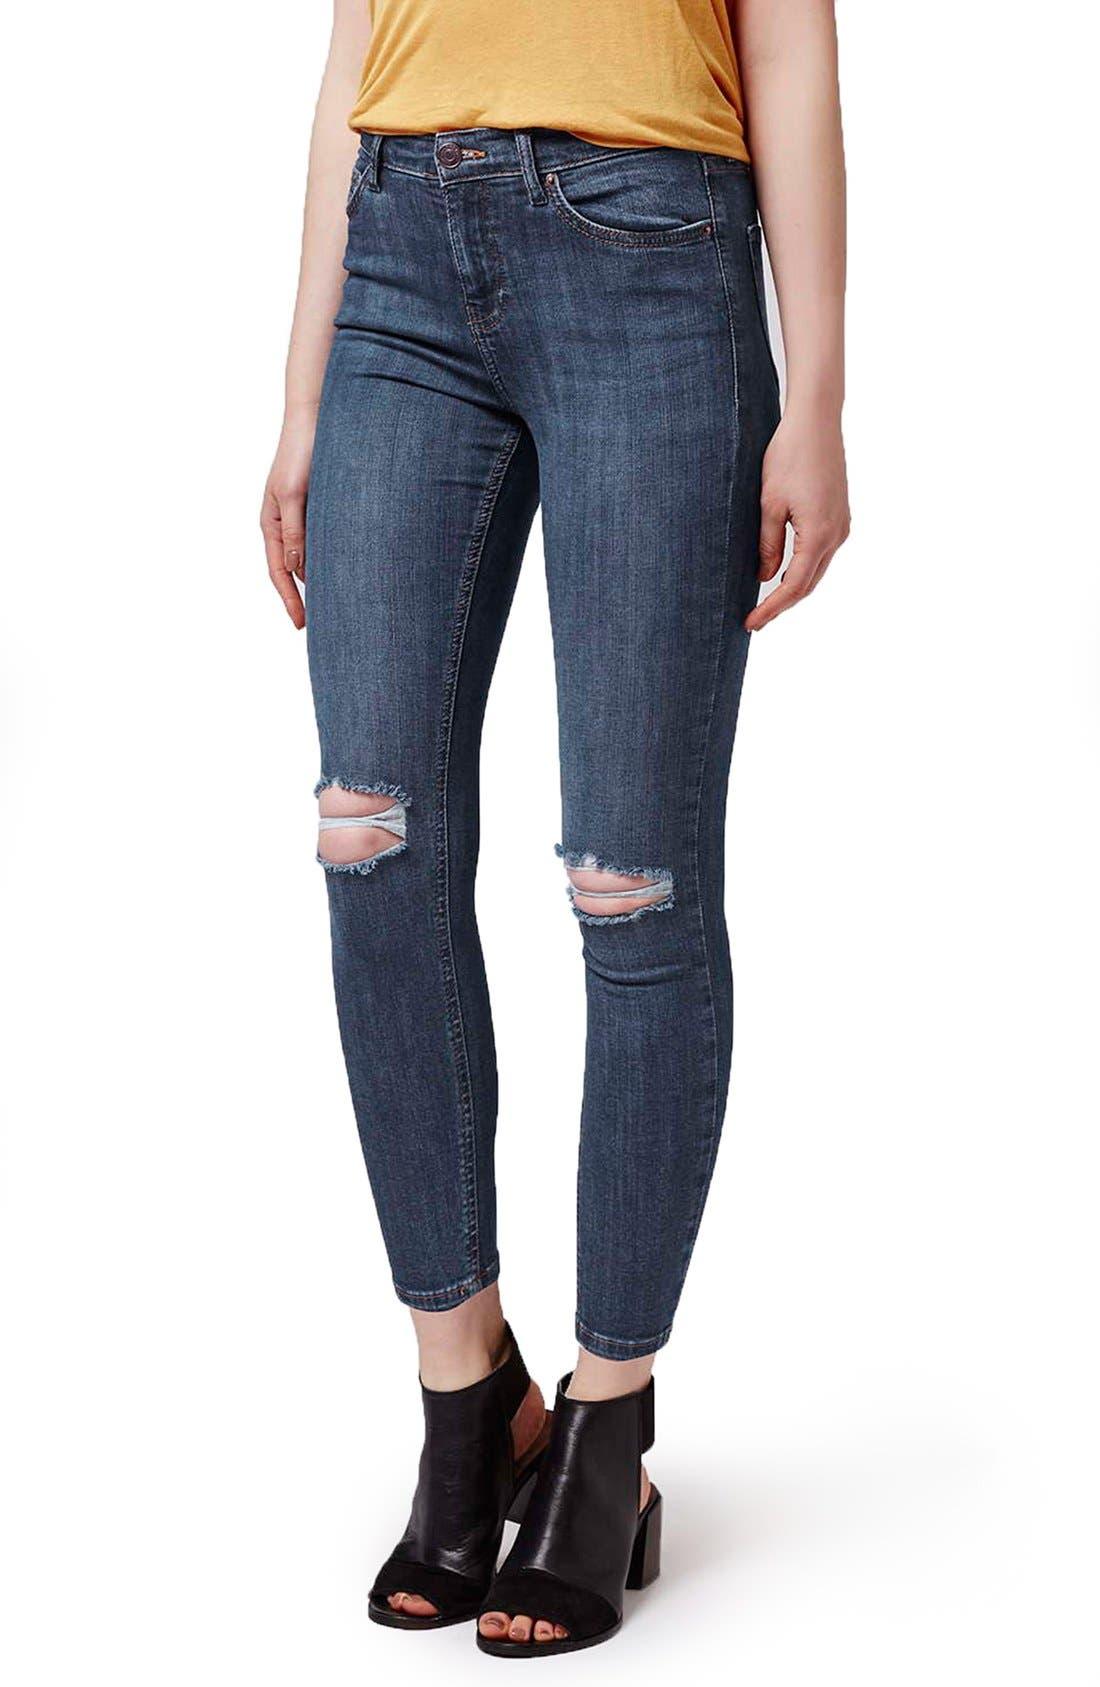 Main Image - Topshop 'Jamie' Ripped Crop Skinny Jeans (Navy Blue) (Petite)